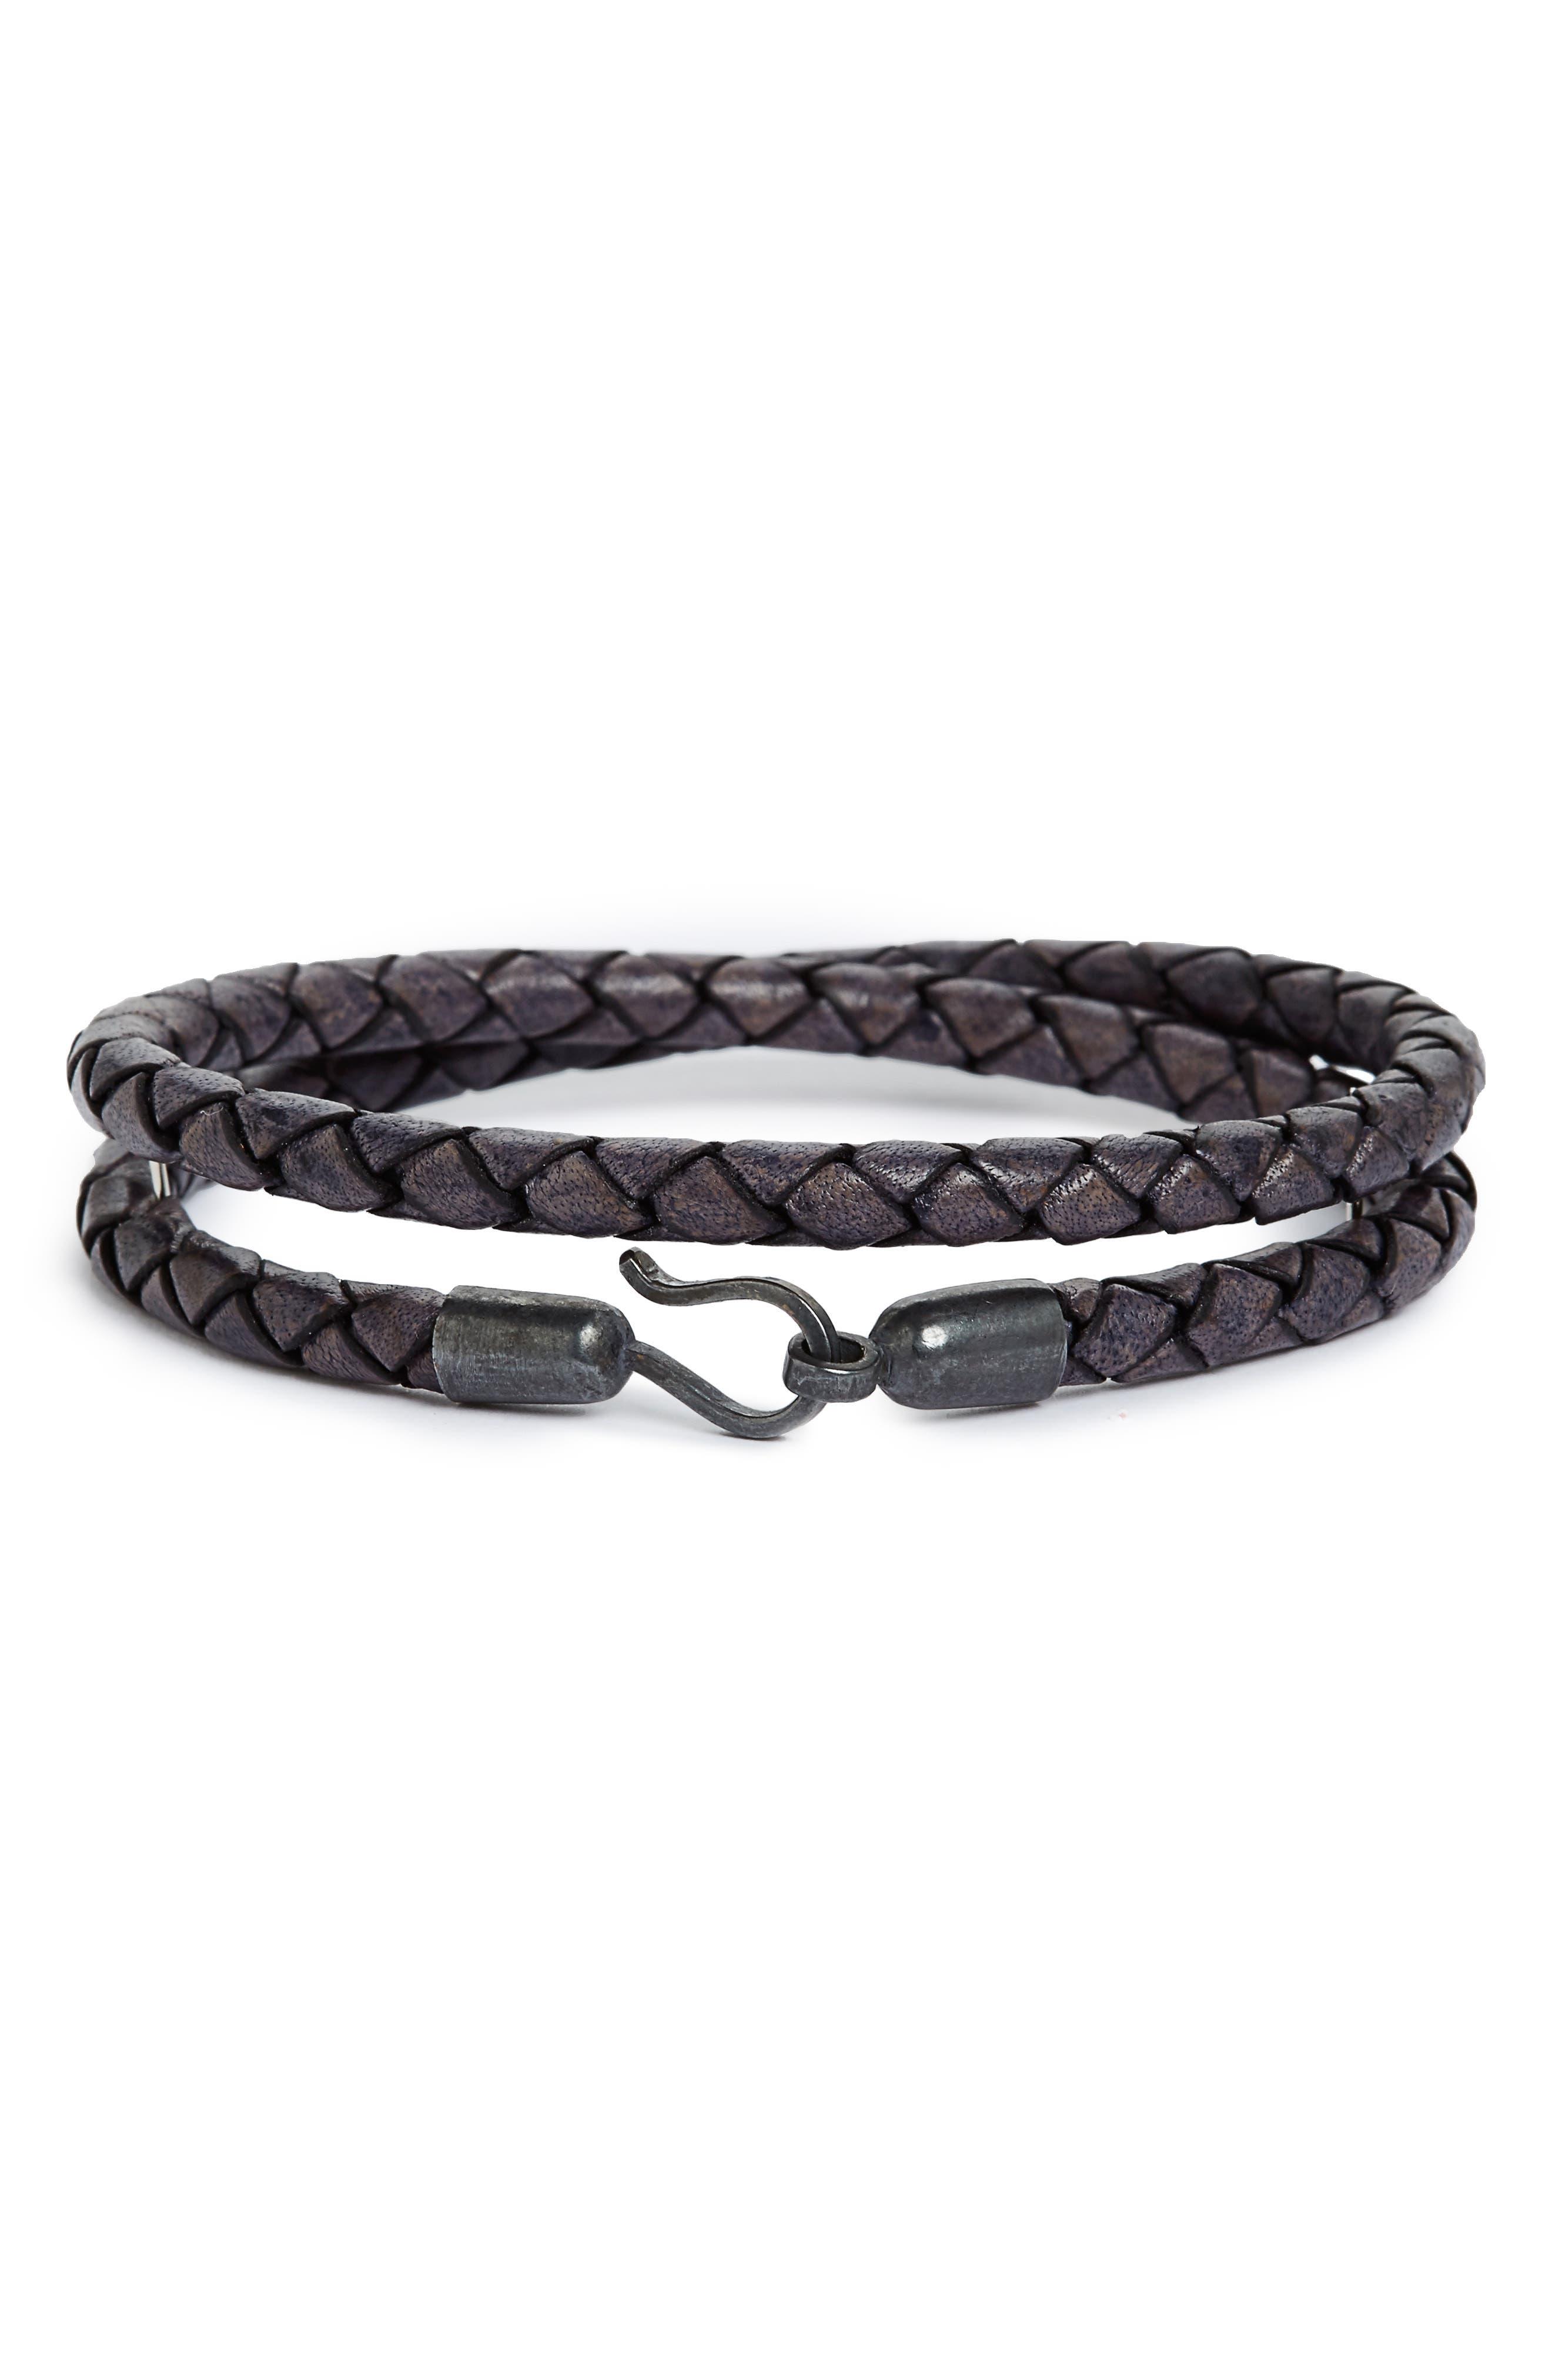 Caputo & Co. Braided Leather Double Wrap Bracelet